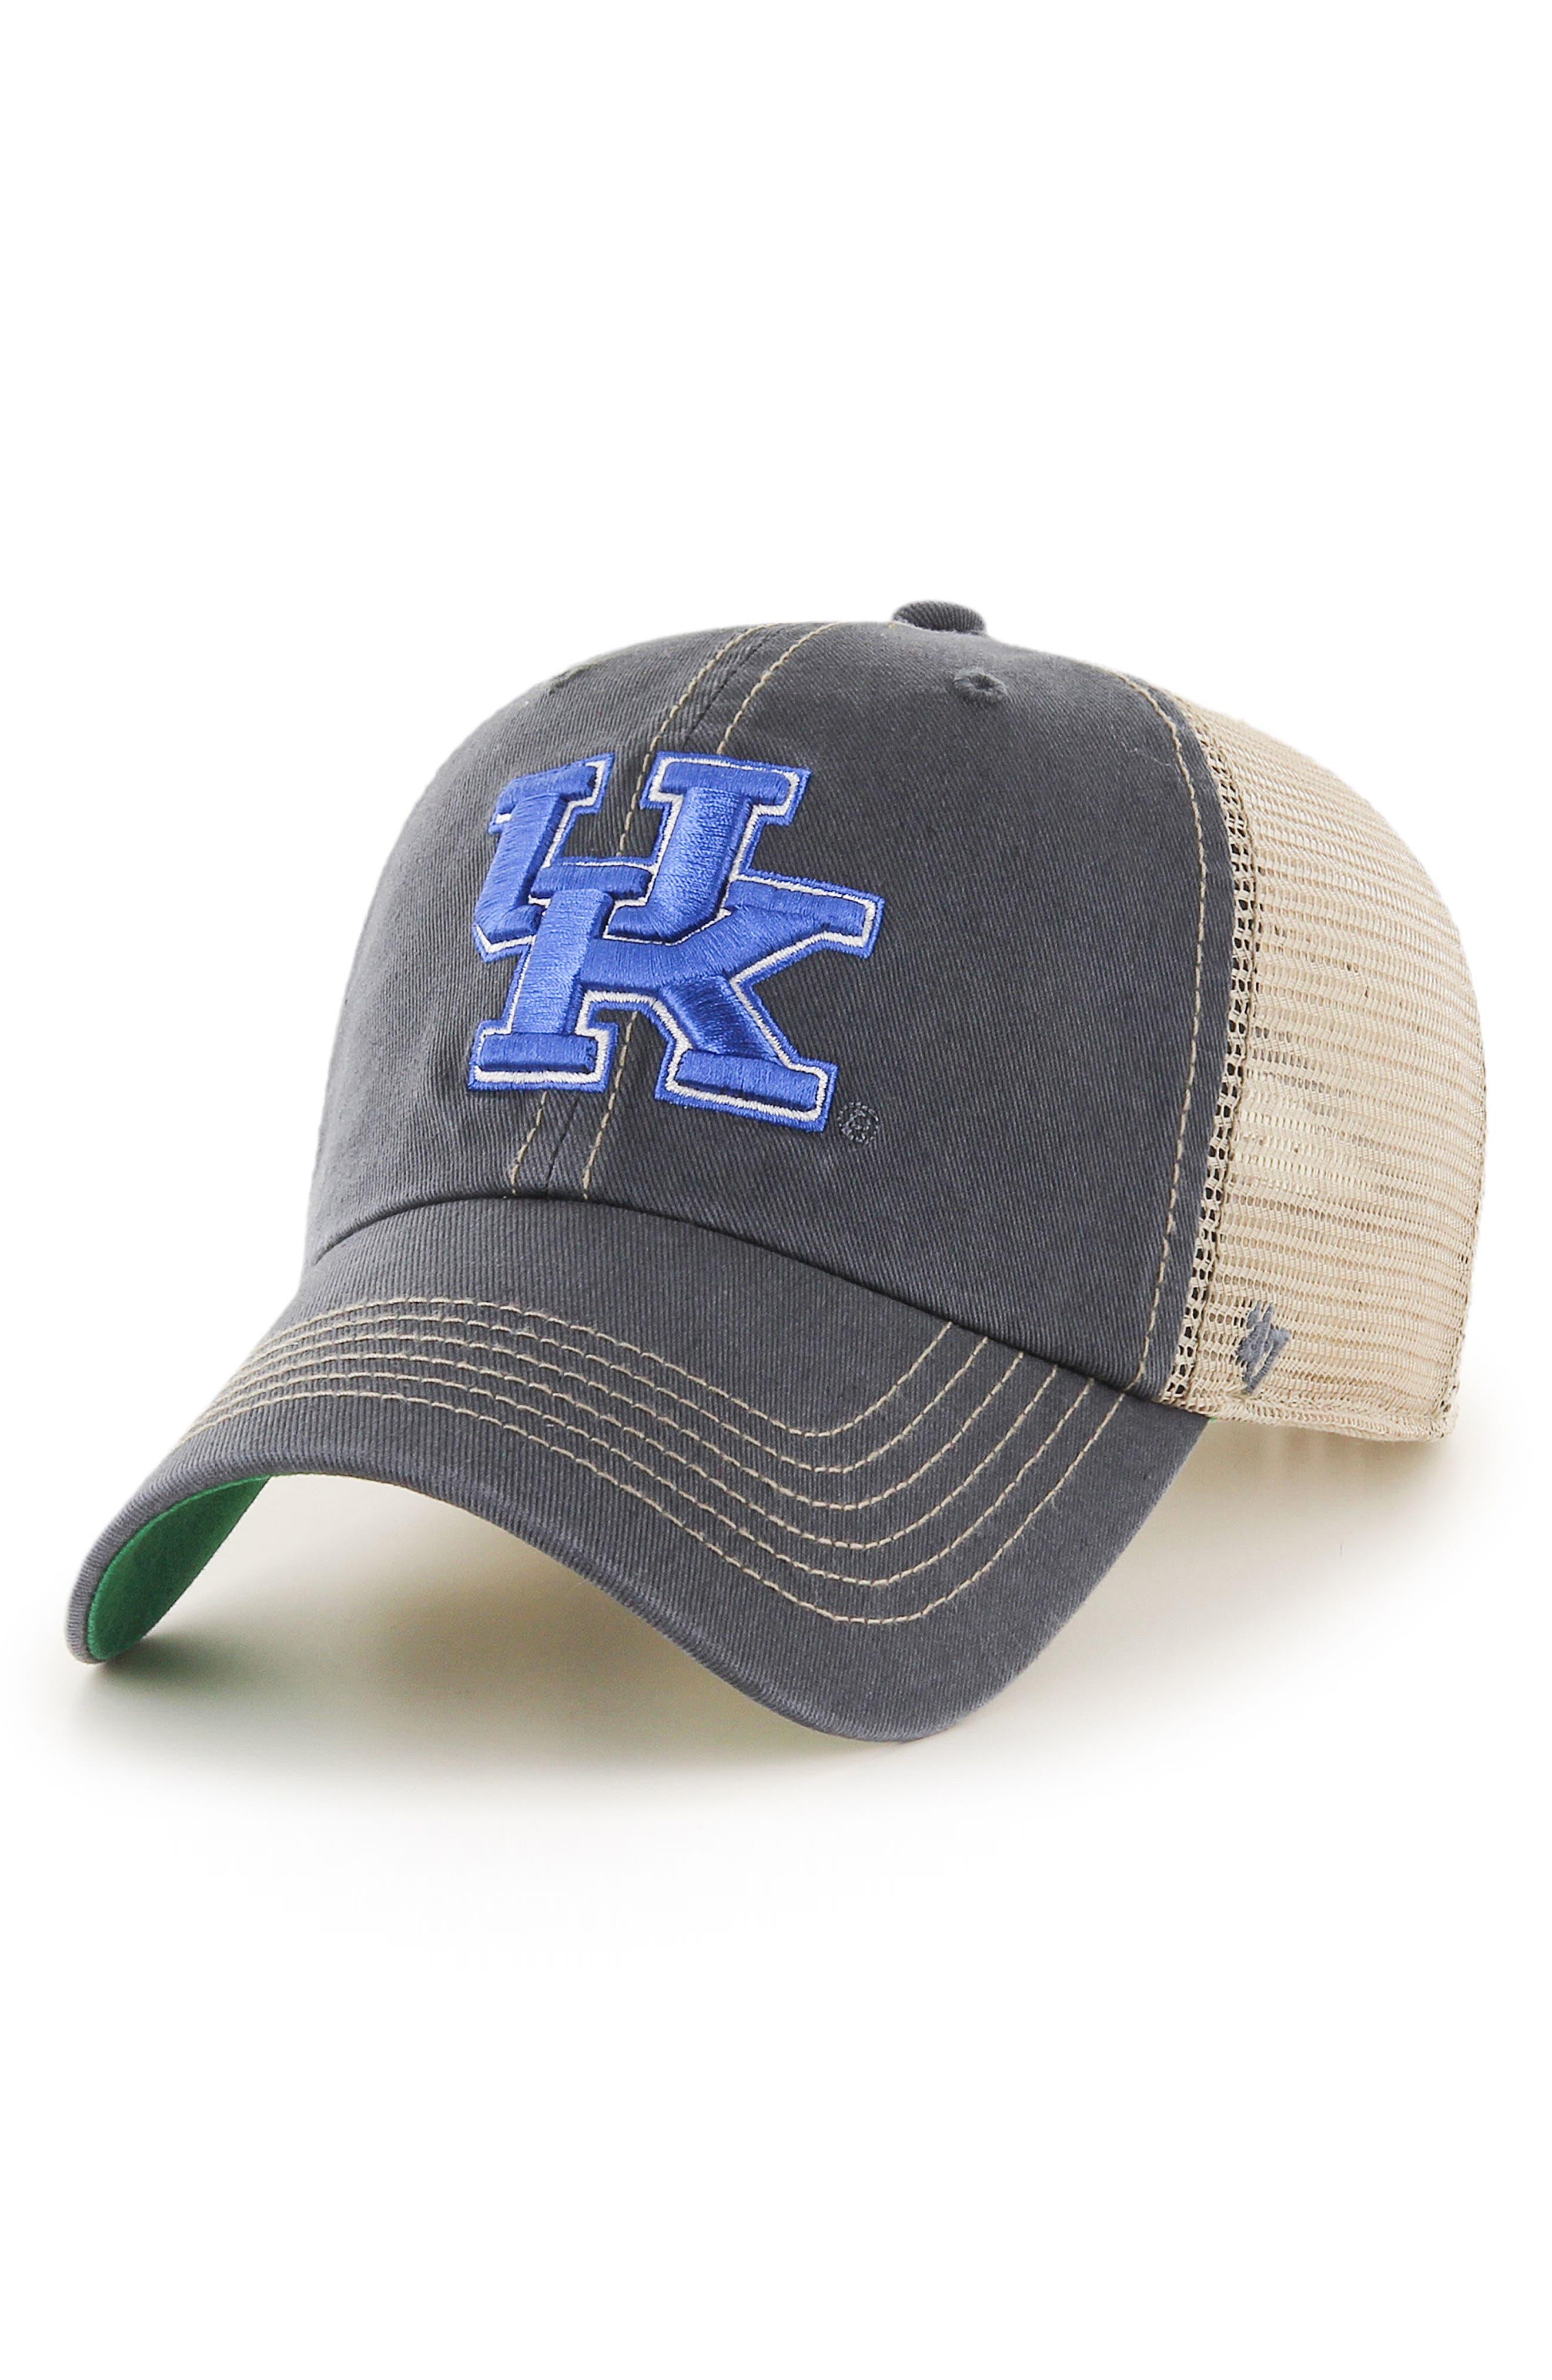 Alternate Image 1 Selected - '47 Collegiate Trawler Clean-Up Trucker Hat